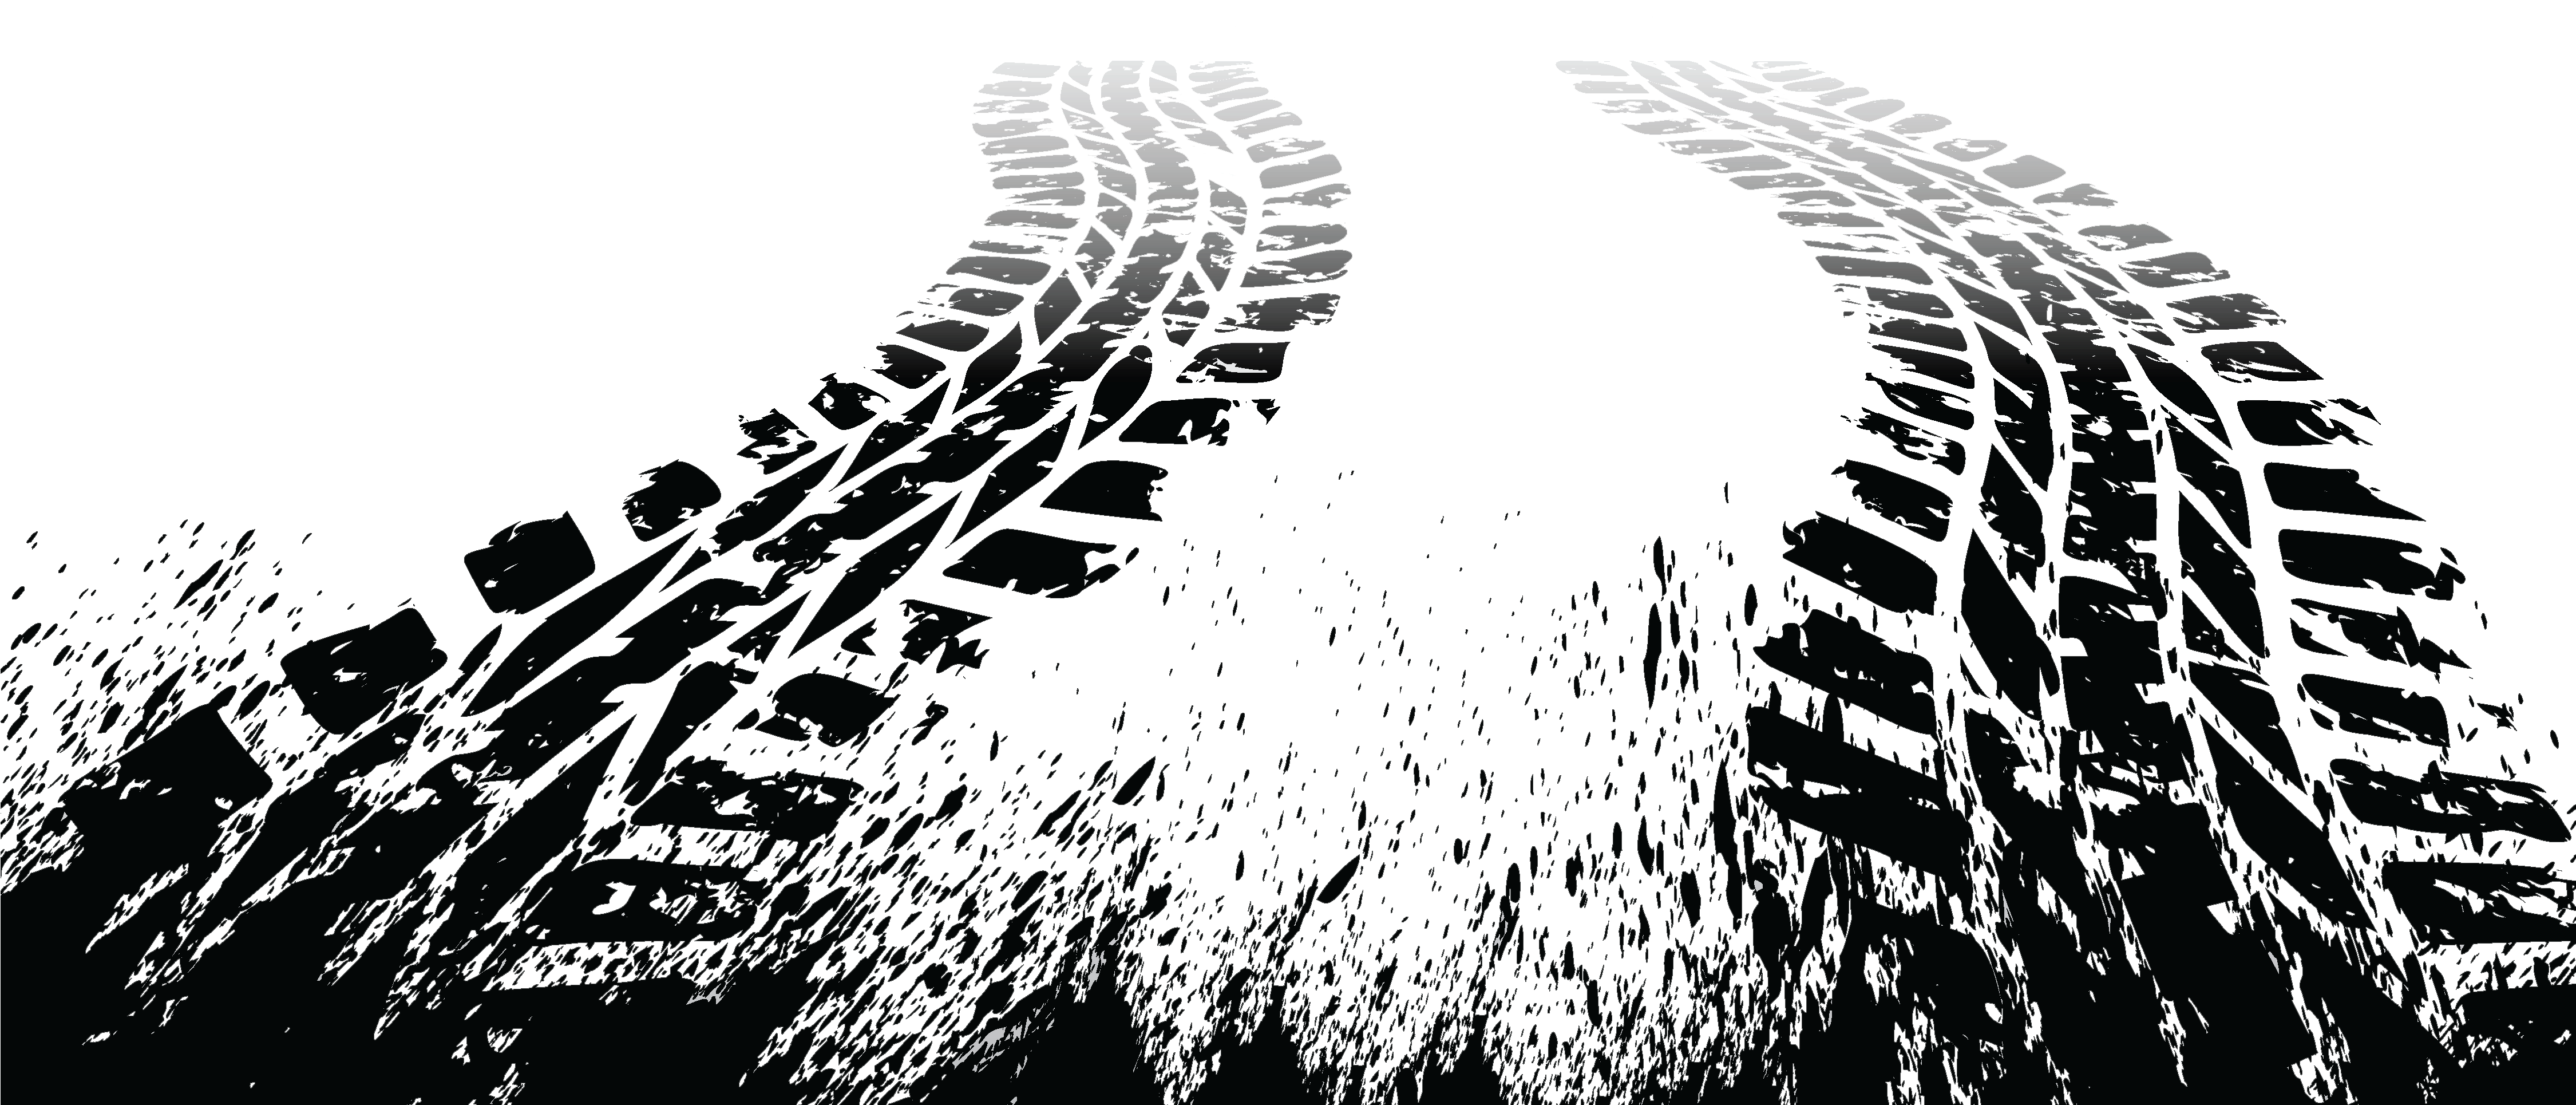 Tread cool cliparts stock. Mud clipart muddy tire